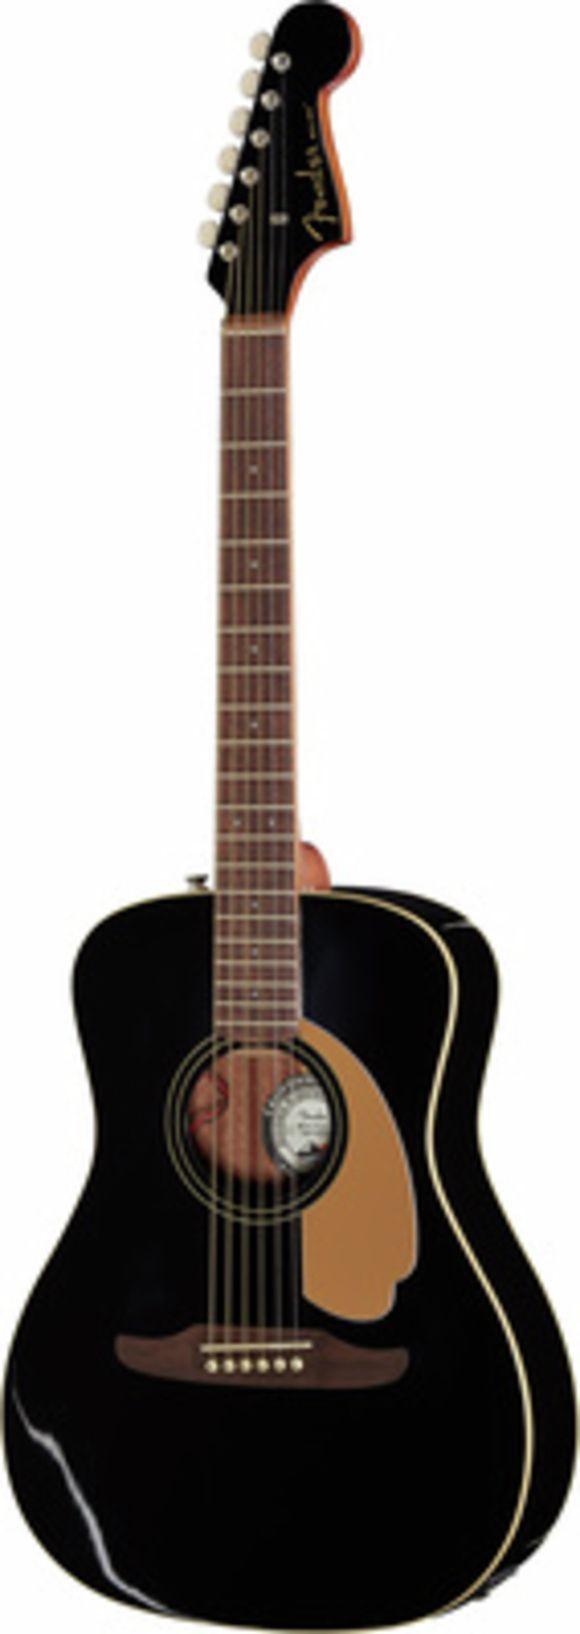 Malibu Player JTB Fender